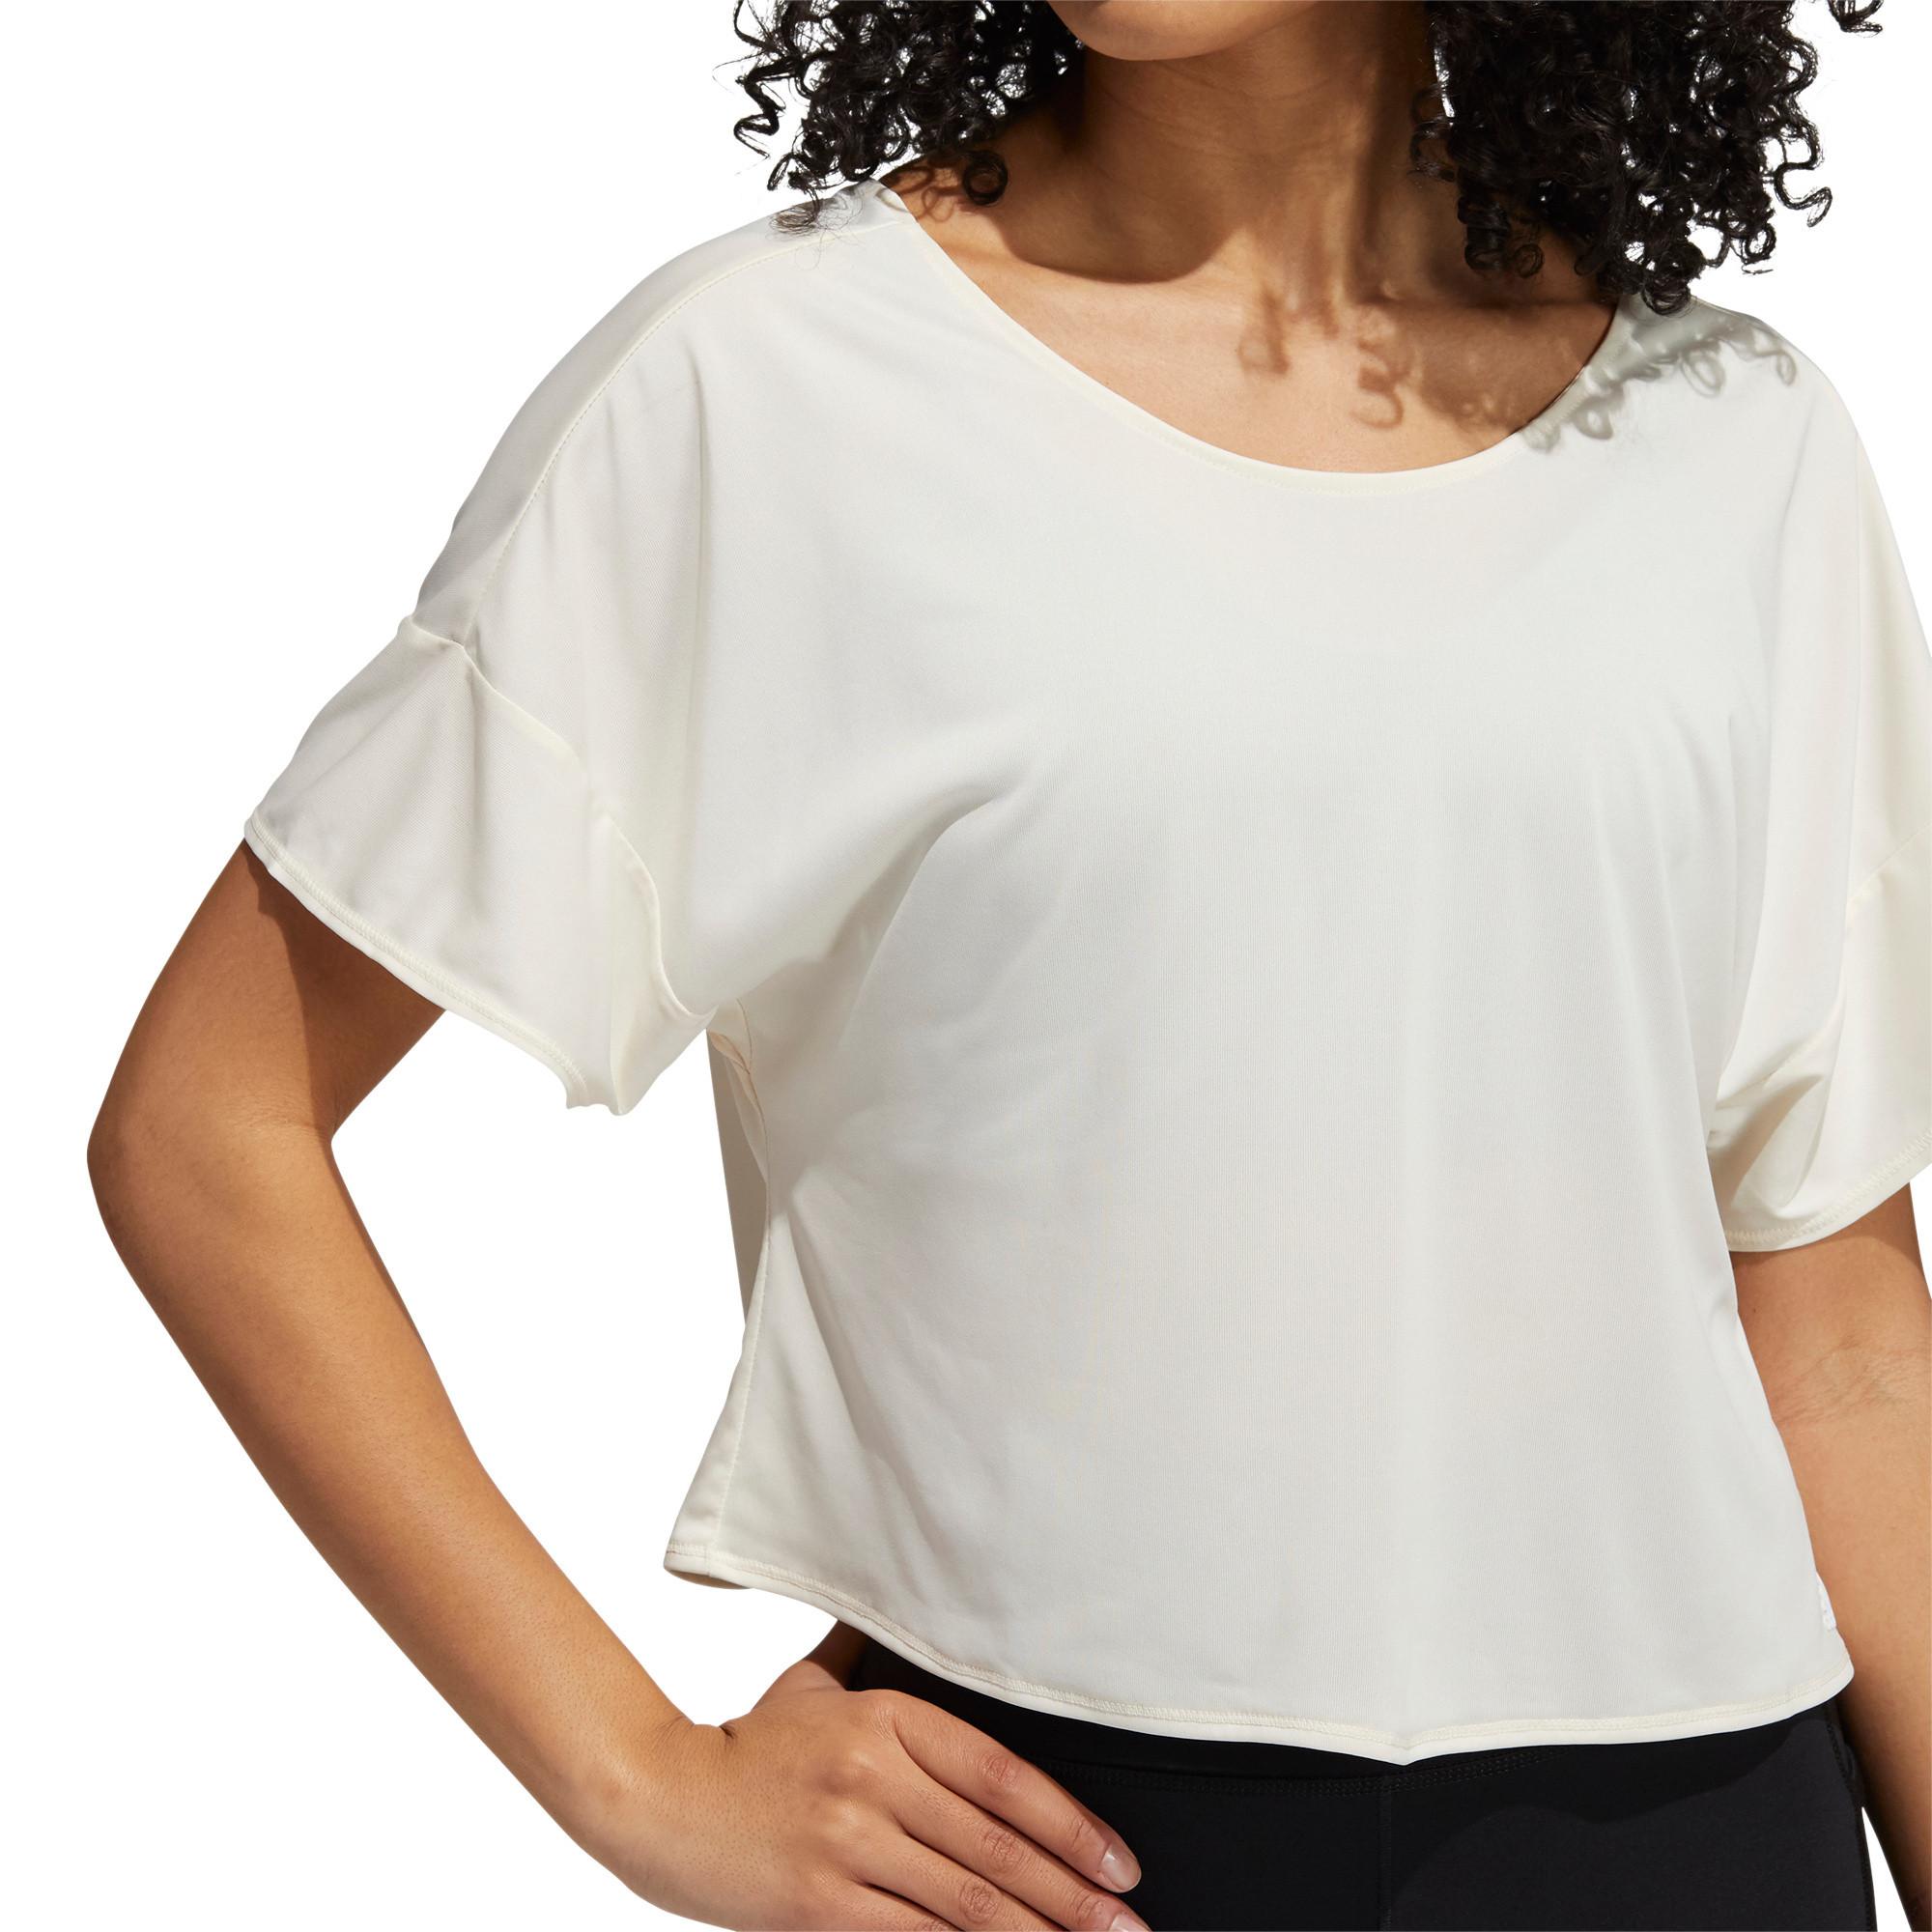 T-shirt Primeblue, Bianco, large image number 4